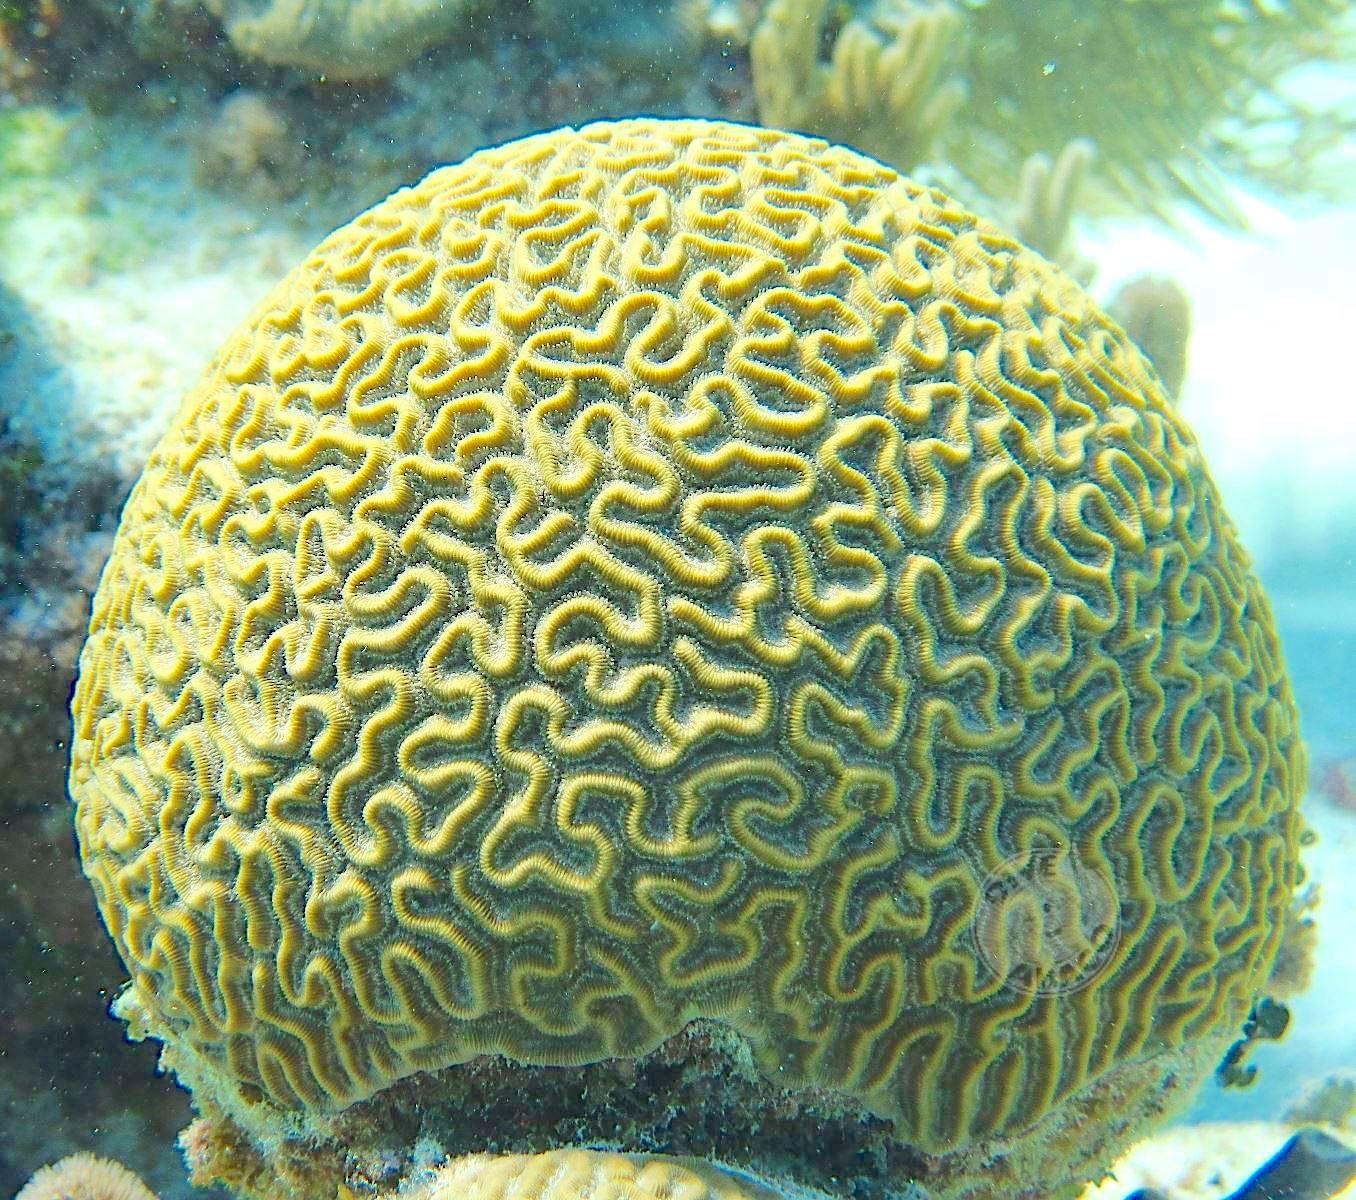 BRAIN CORAL Abaco Bahamas (Melinda Rogers / Dive Abaco)